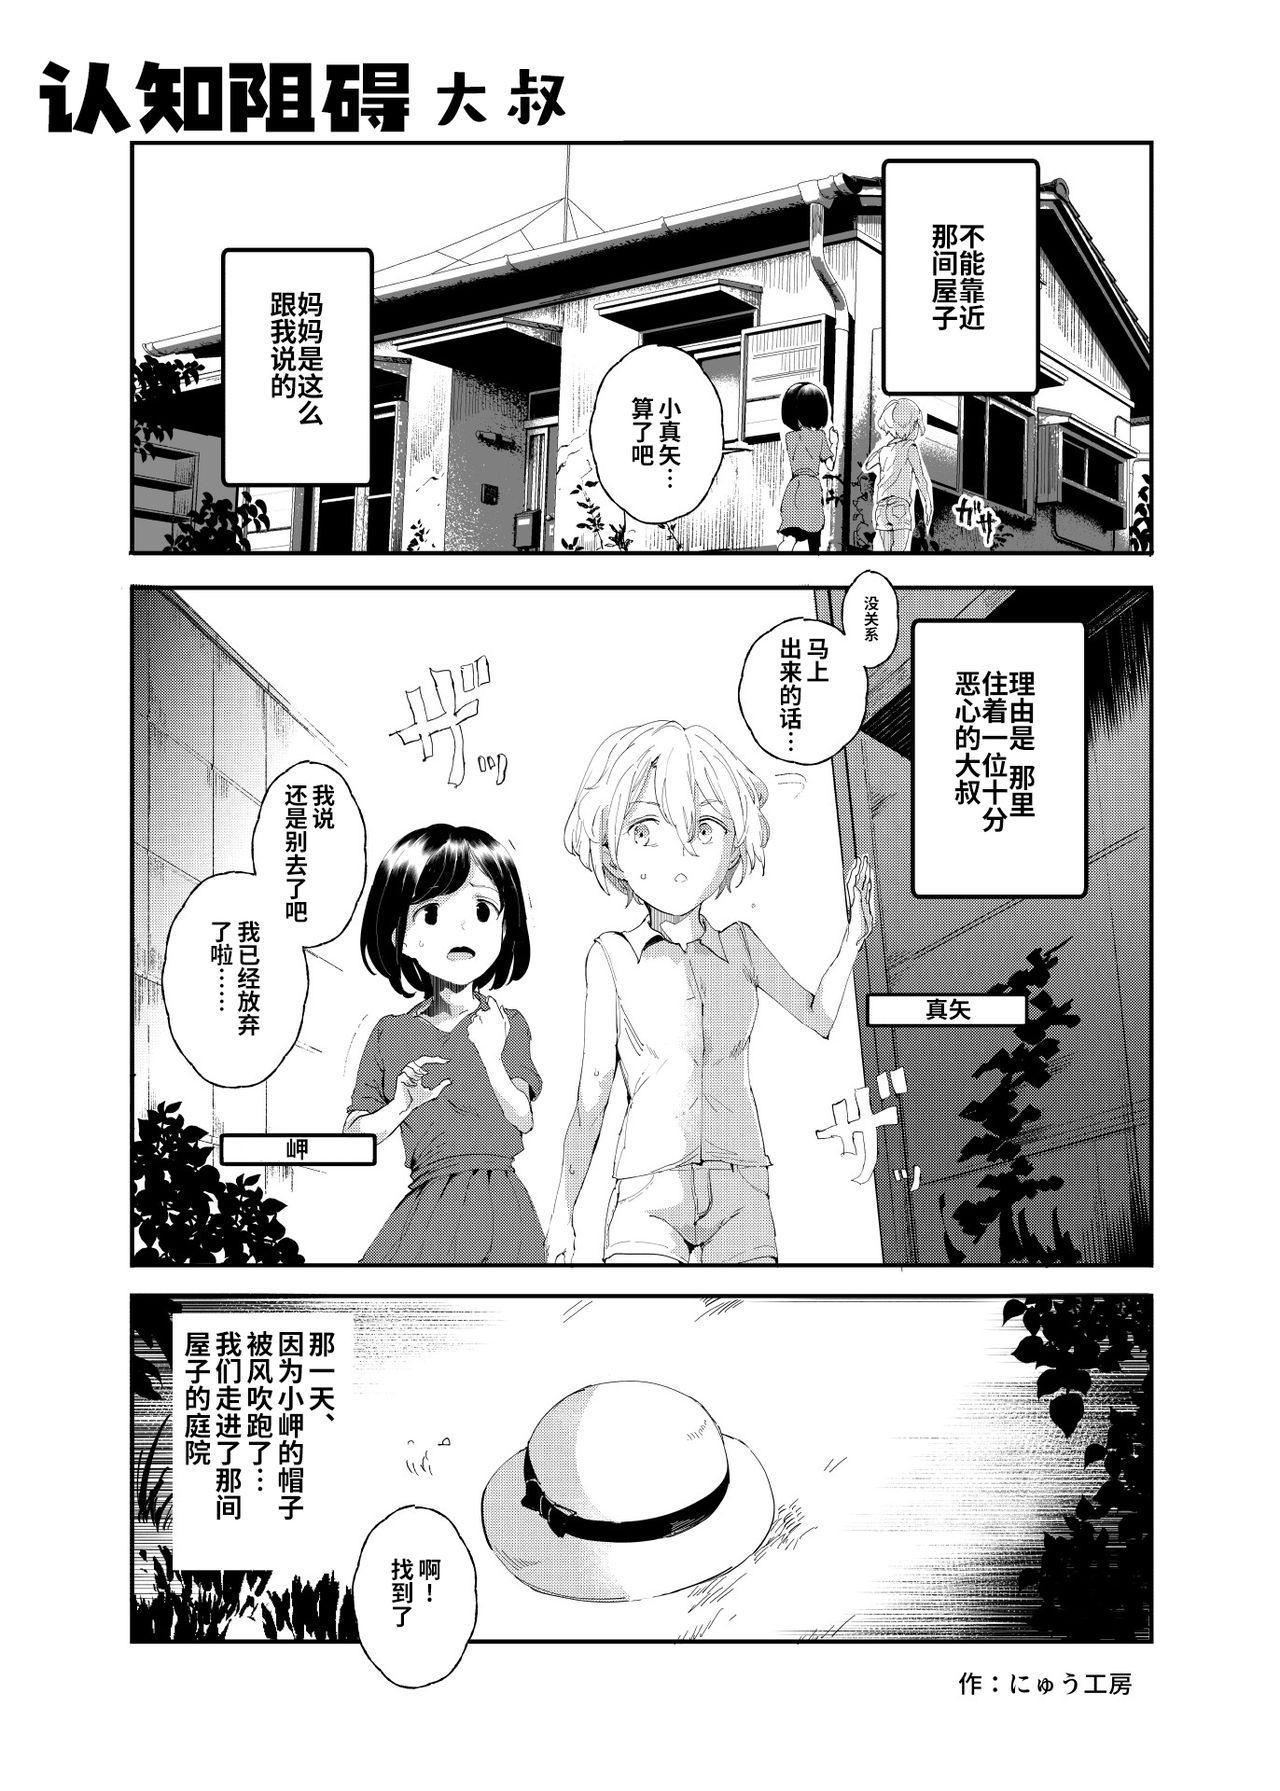 [Nyuu Koubou (Nyuu)] Ninshiki Sogai Oji-san ~Dogeza de Ecchi o Onegai suru Shoujo-tachi~ [Chinese] [神官冰点汉化] [Digital] 4